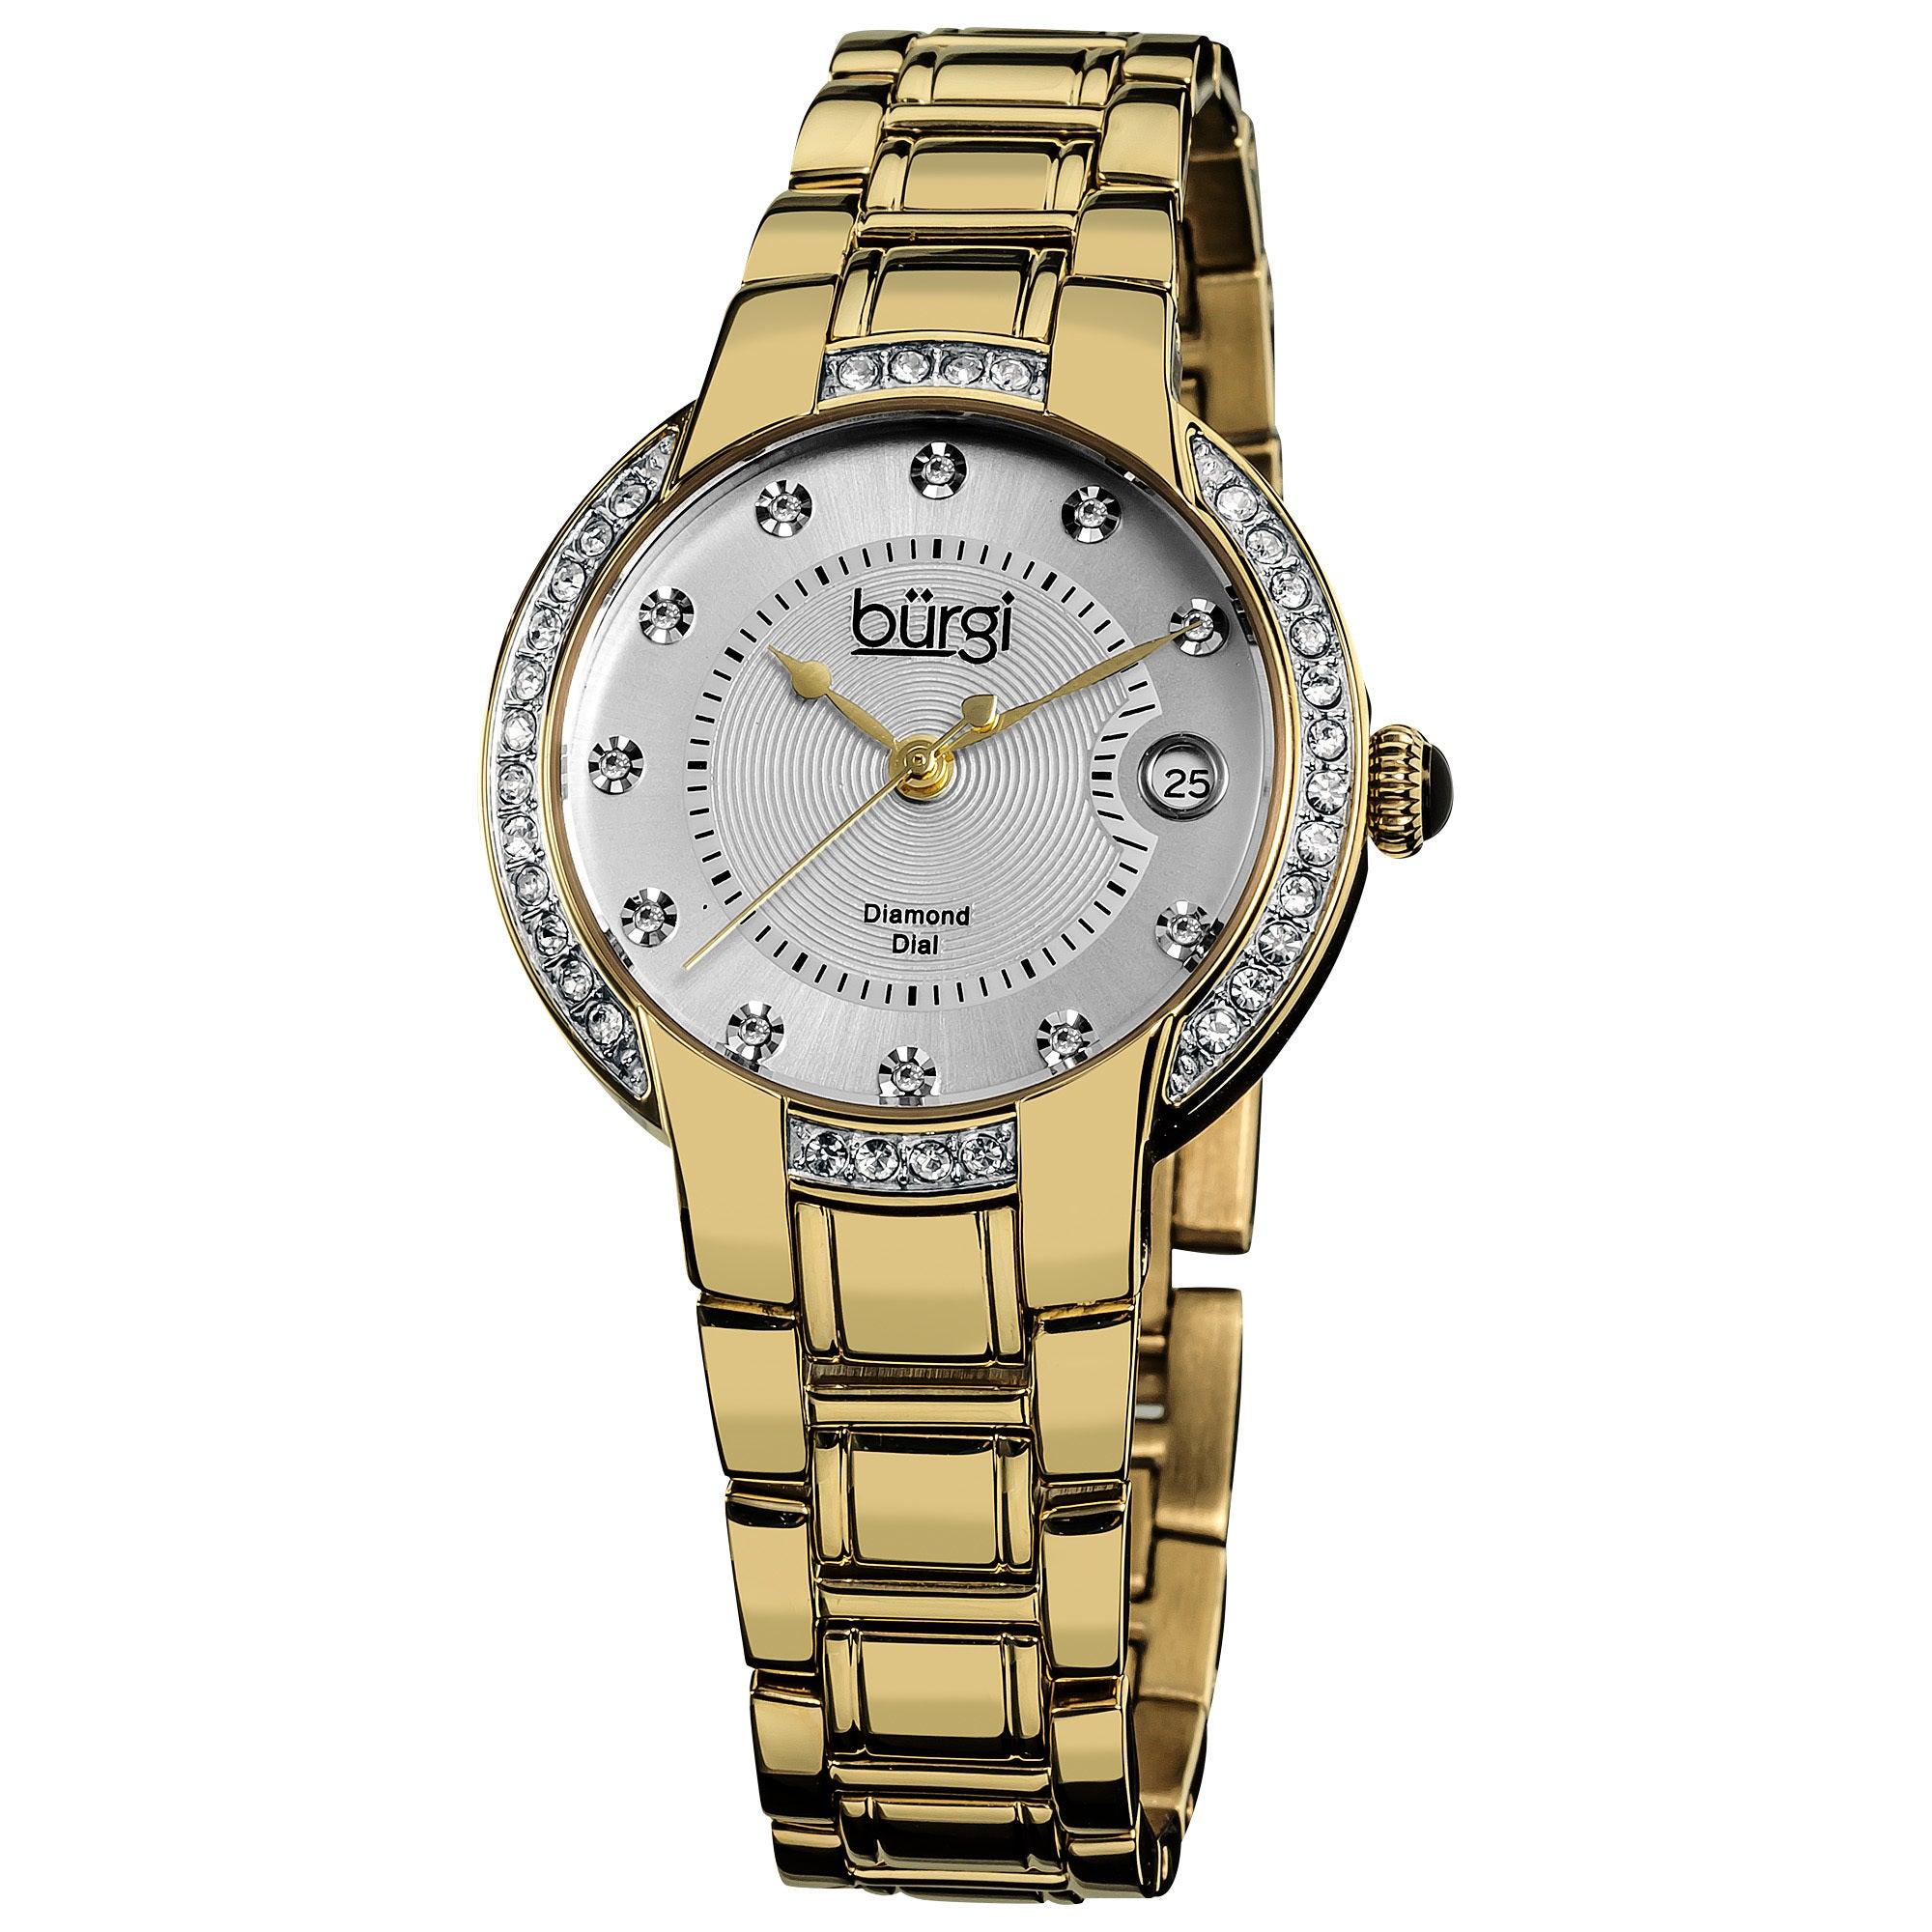 Burgi Women's Stainless Steel Diamond Date Gold-Tone Brac...